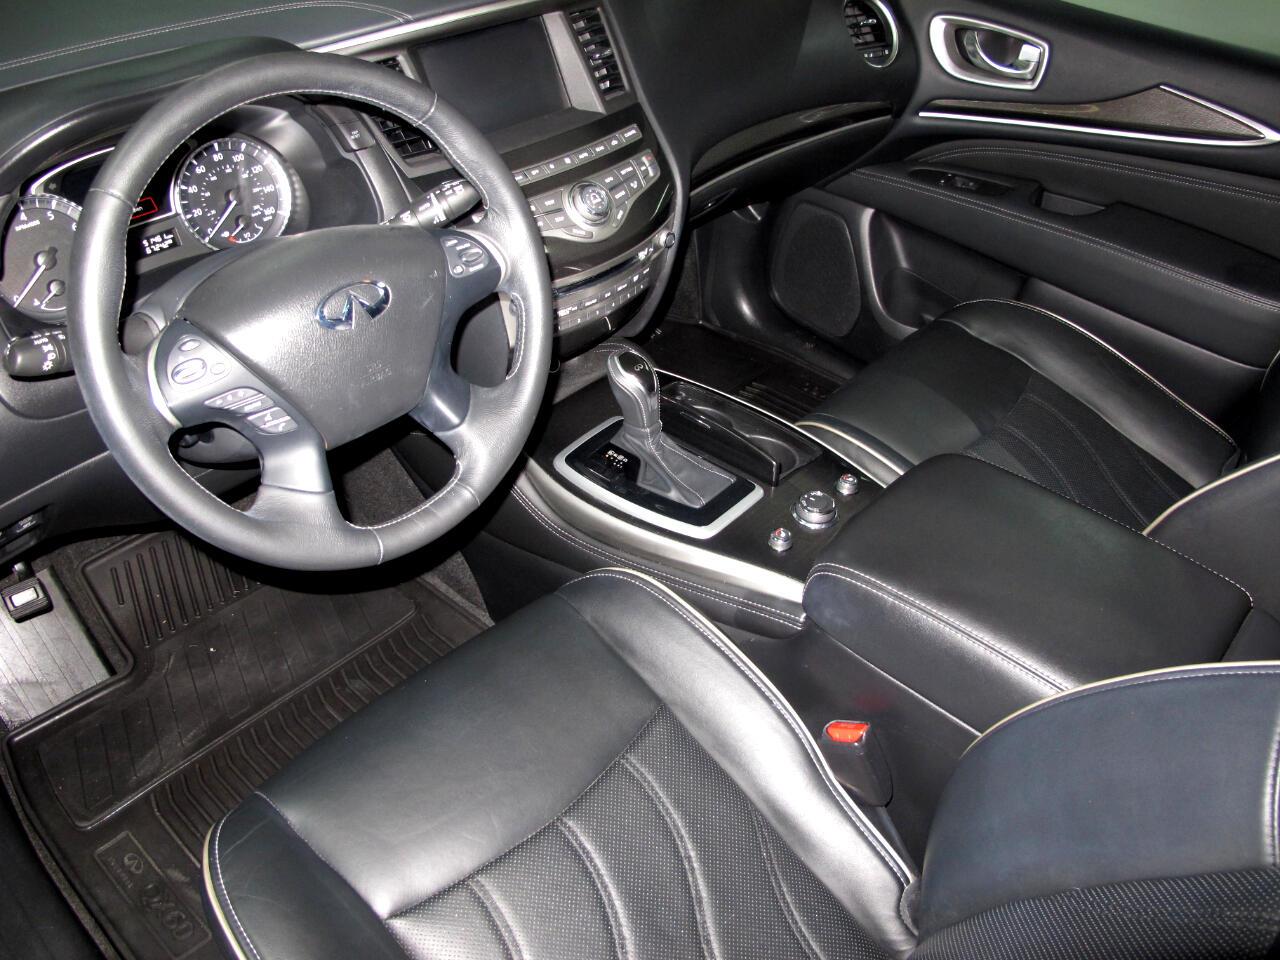 2016 Infiniti QX60 FWD 4dr